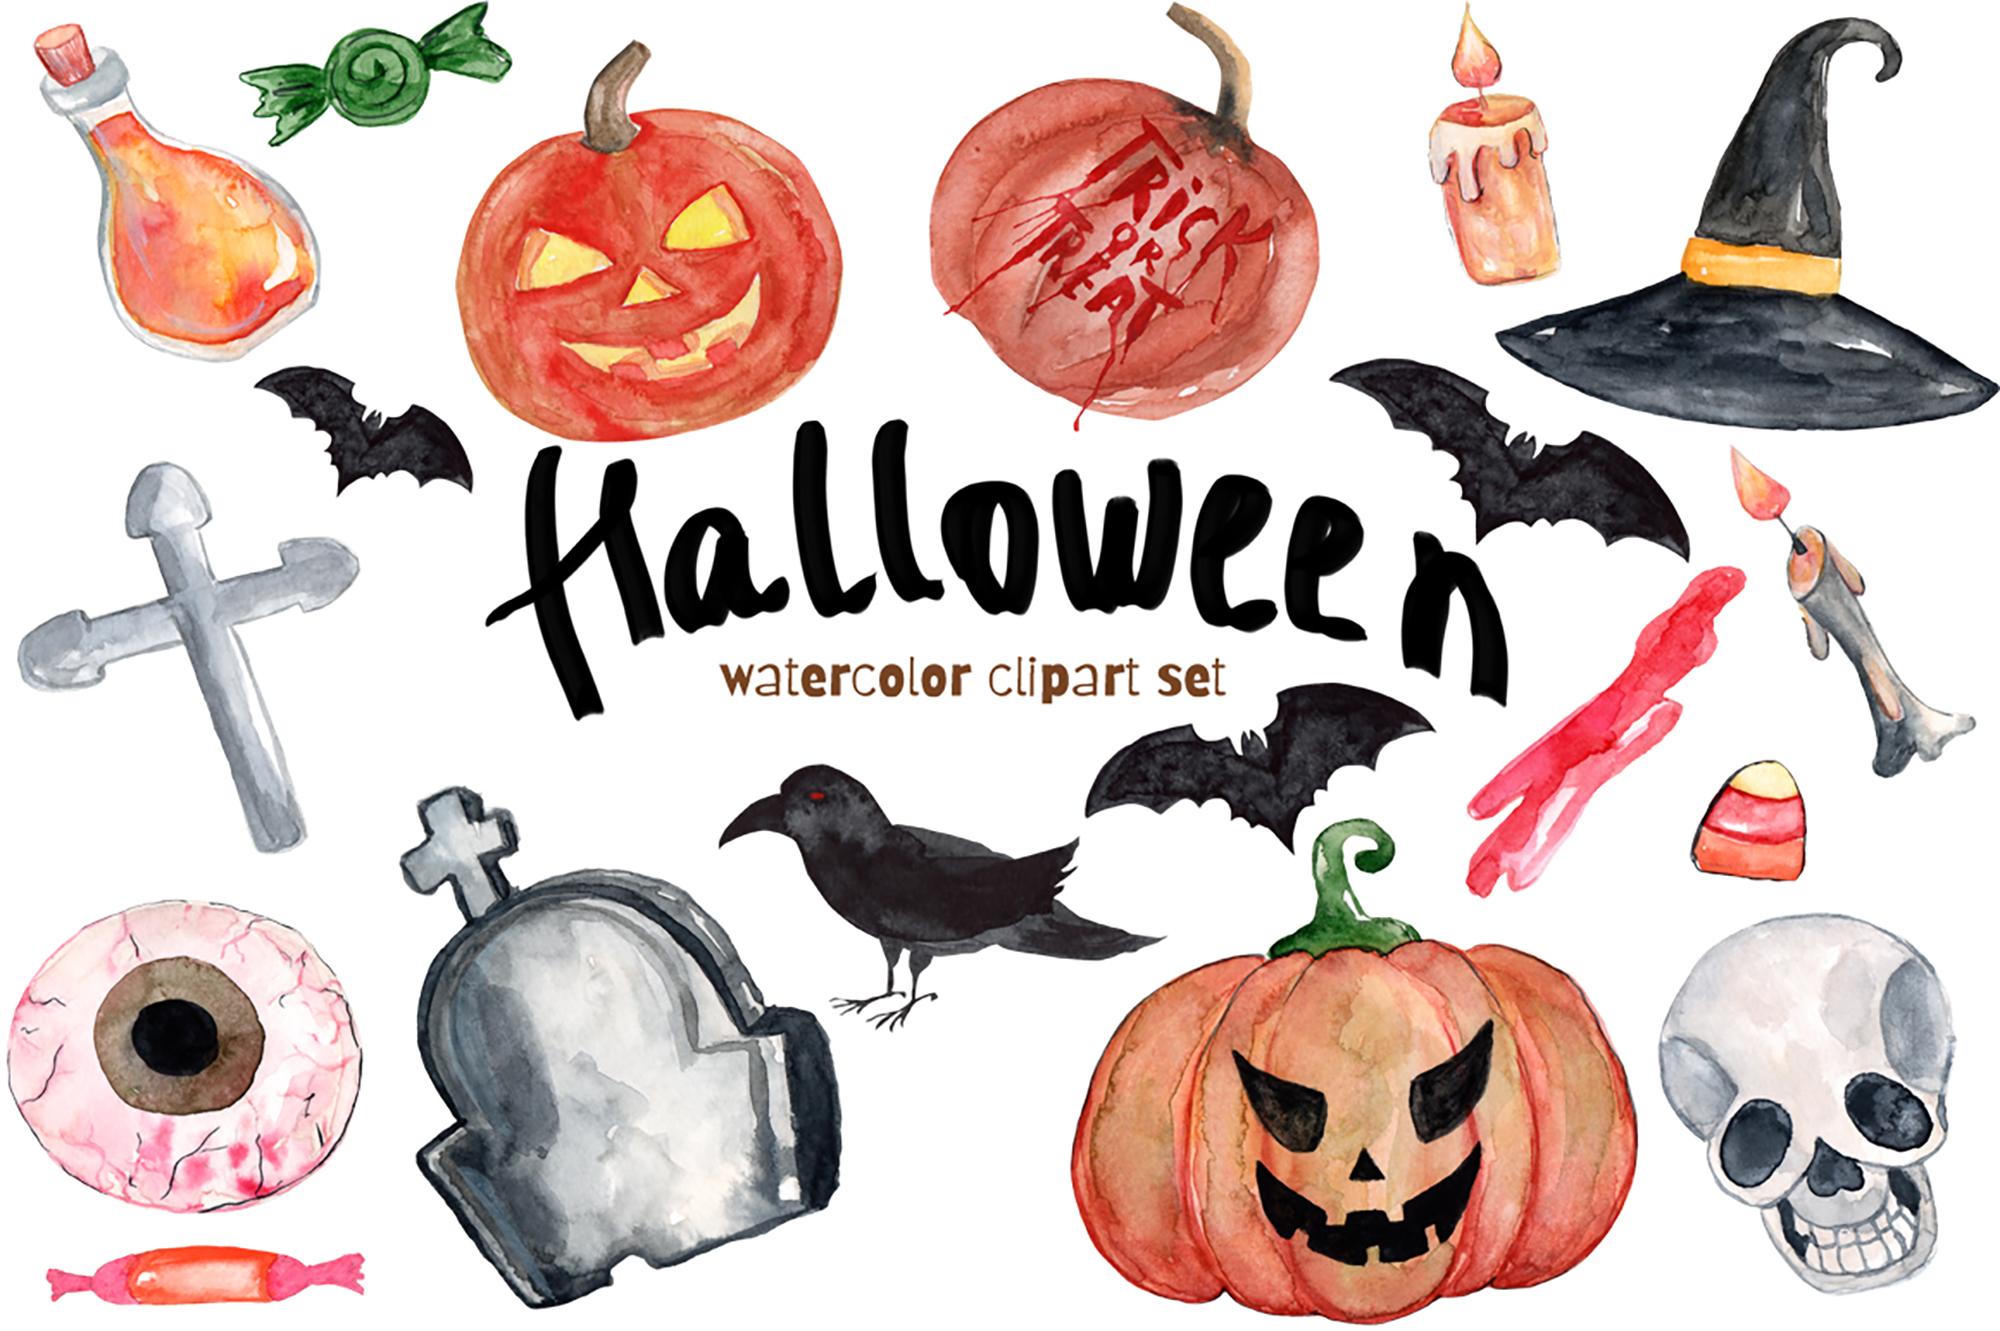 Watercolor Clipart Halloween Bundles with Bats Pumpkins example image 1